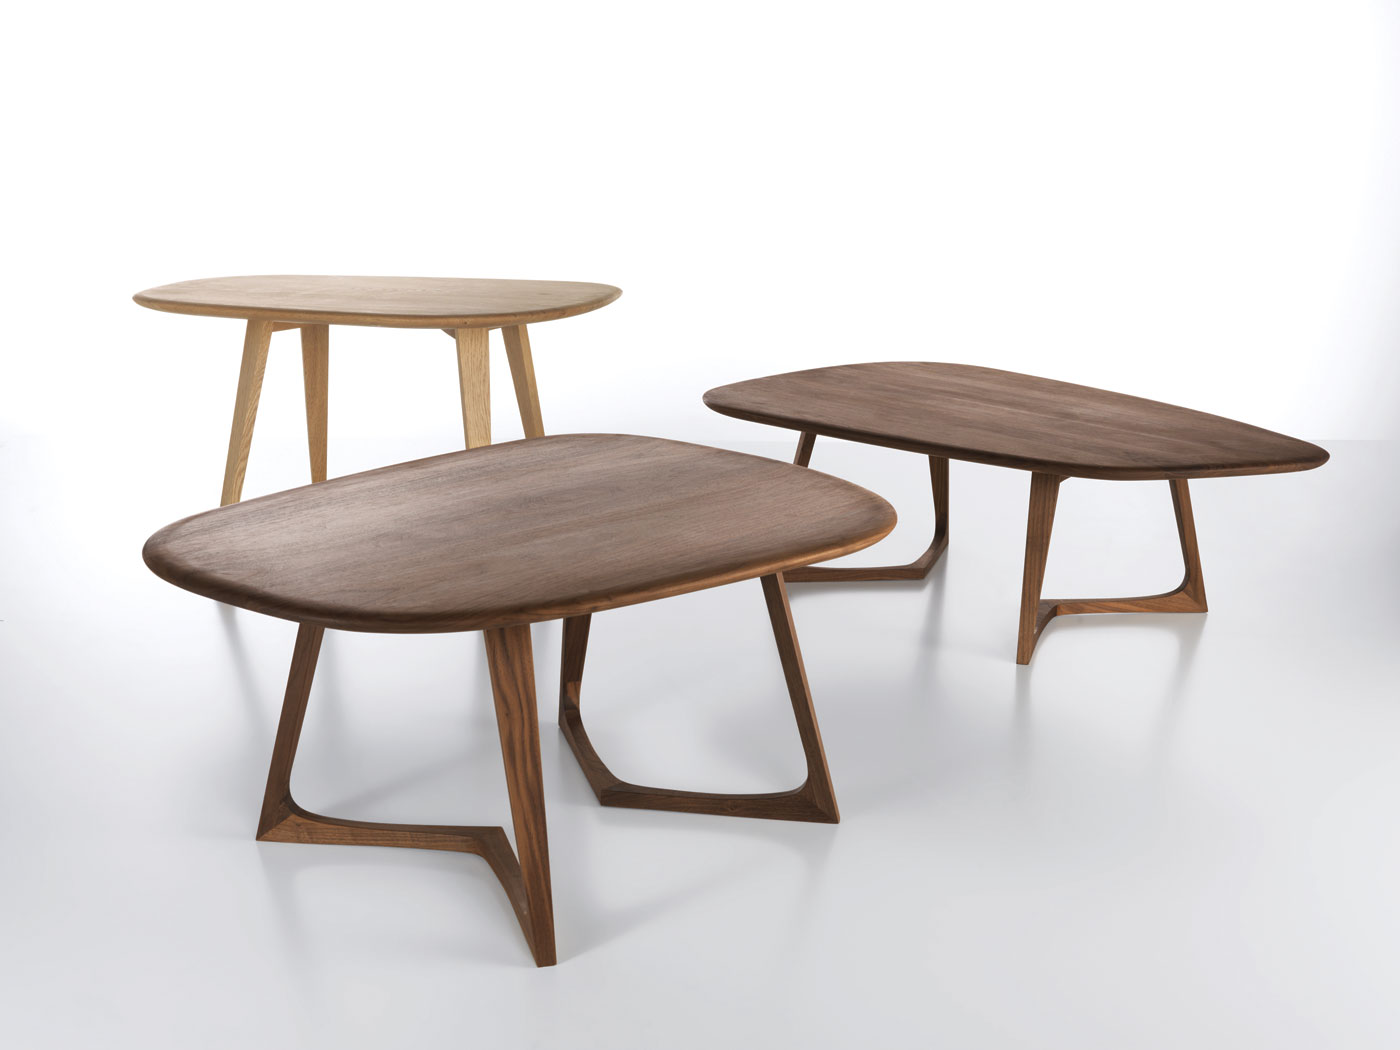 modern furniture lighting spencer interiors zeitraum. Black Bedroom Furniture Sets. Home Design Ideas